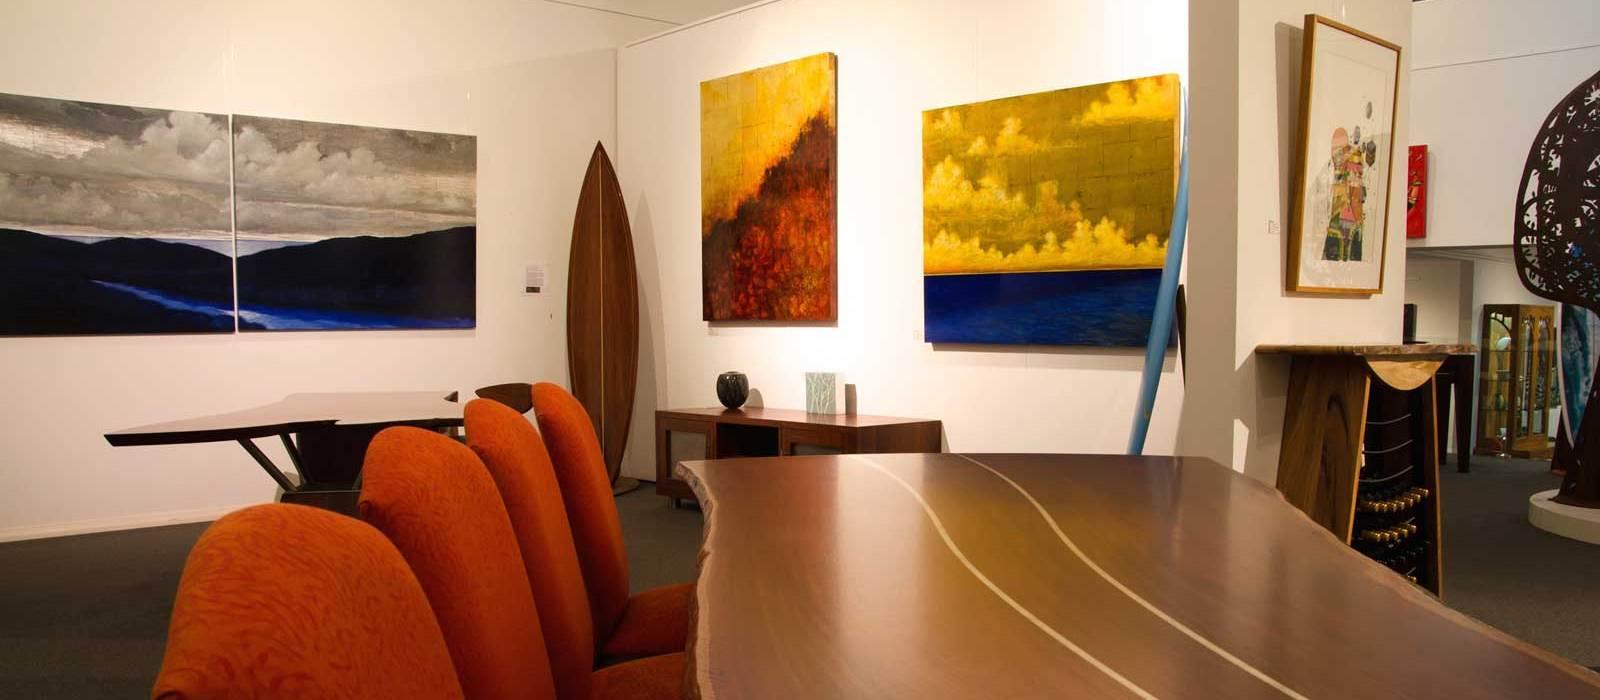 Inside-Gallery-1-2014-e1414293415925